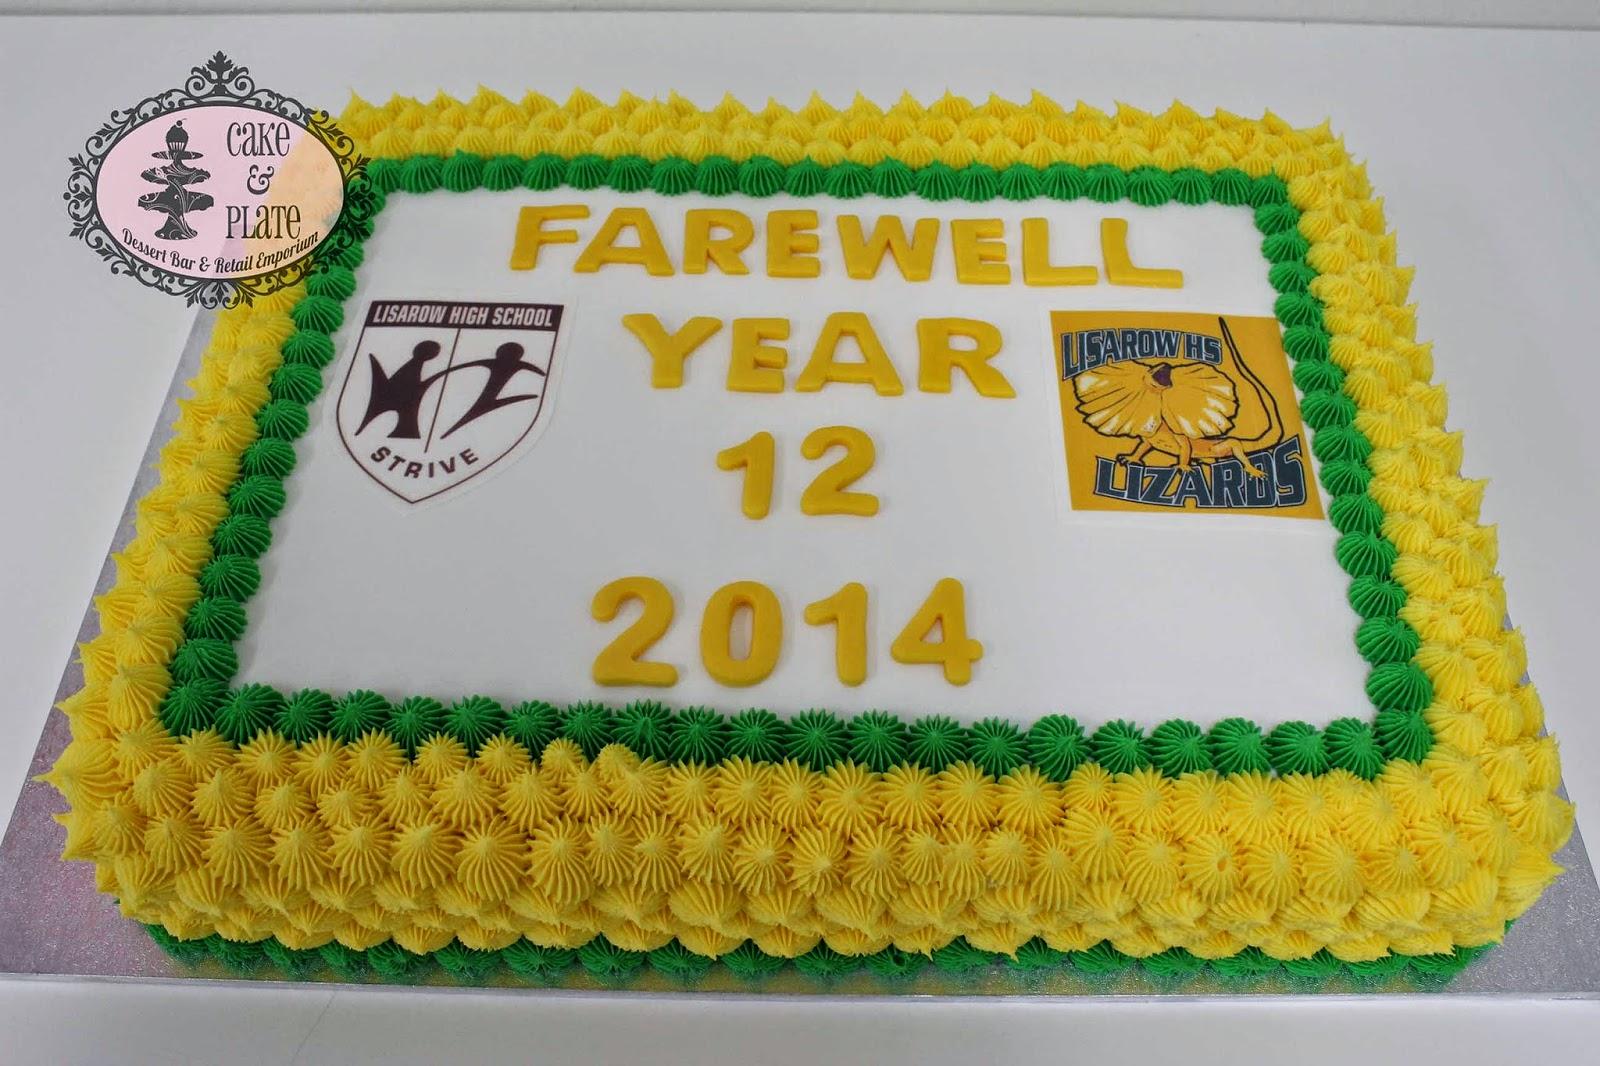 School Cakes for 2014  sc 1 st  Cake u0026 Plate - Blogger & Cake u0026 Plate: 2014